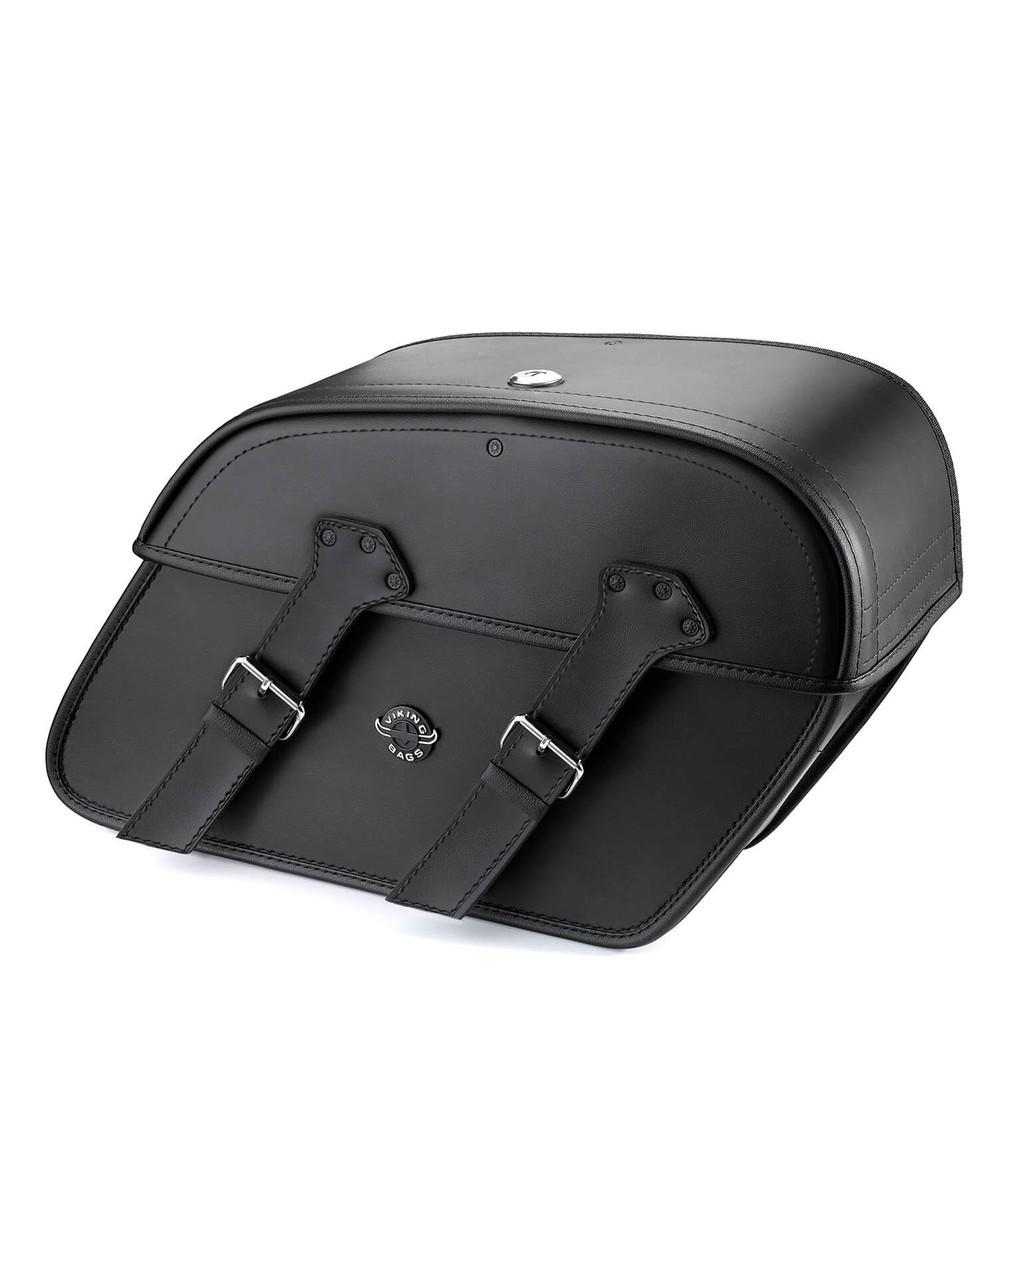 Viking Raven Medium Leather Motorcycle Saddlebags For Harley Softail Springer FXSTS Main Bag View